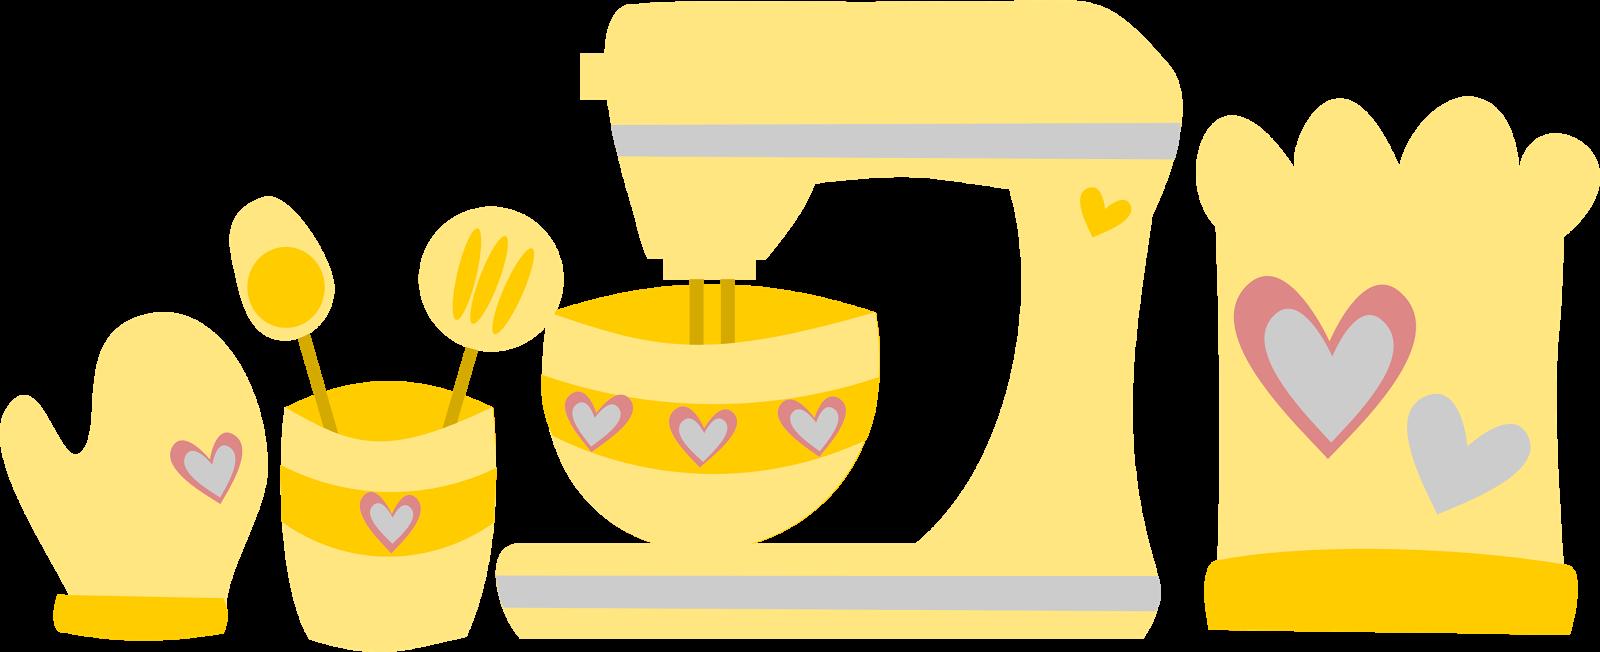 inkscape, amasadora, clip art, amarillo, corazón, diseño, cocina, kitchen aid